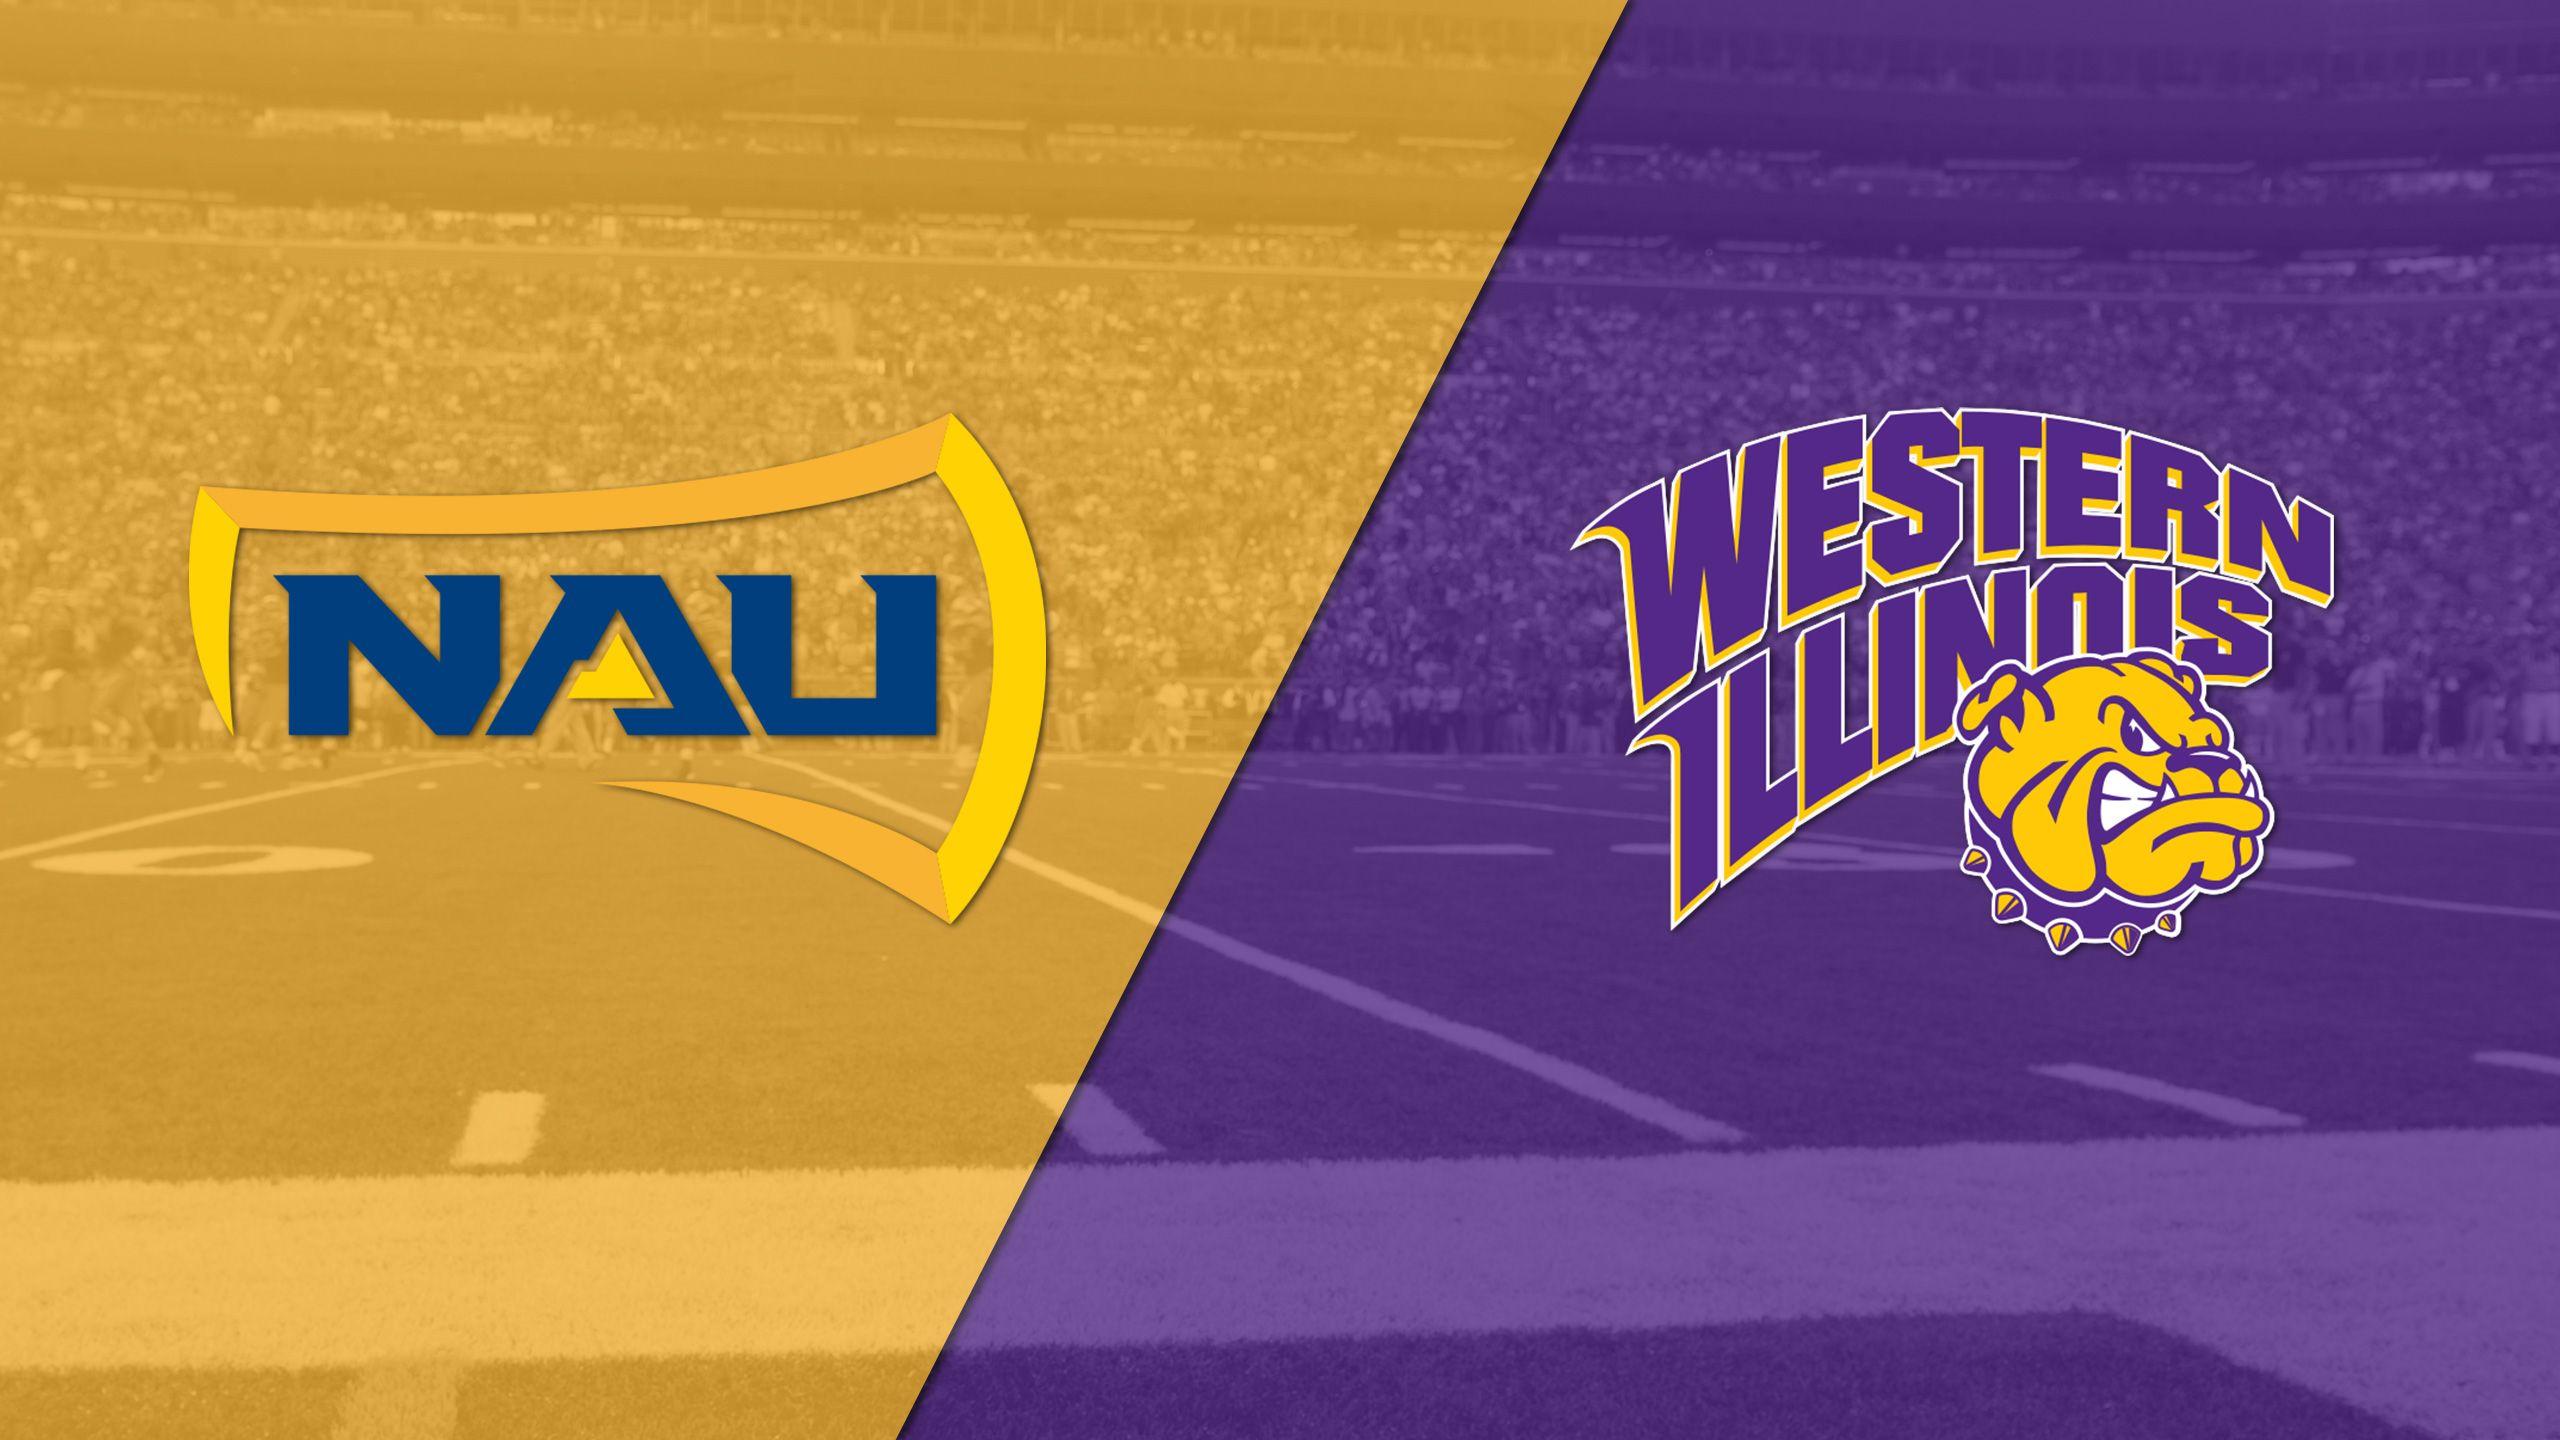 Northern Arizona vs. Western Illinois (Football)